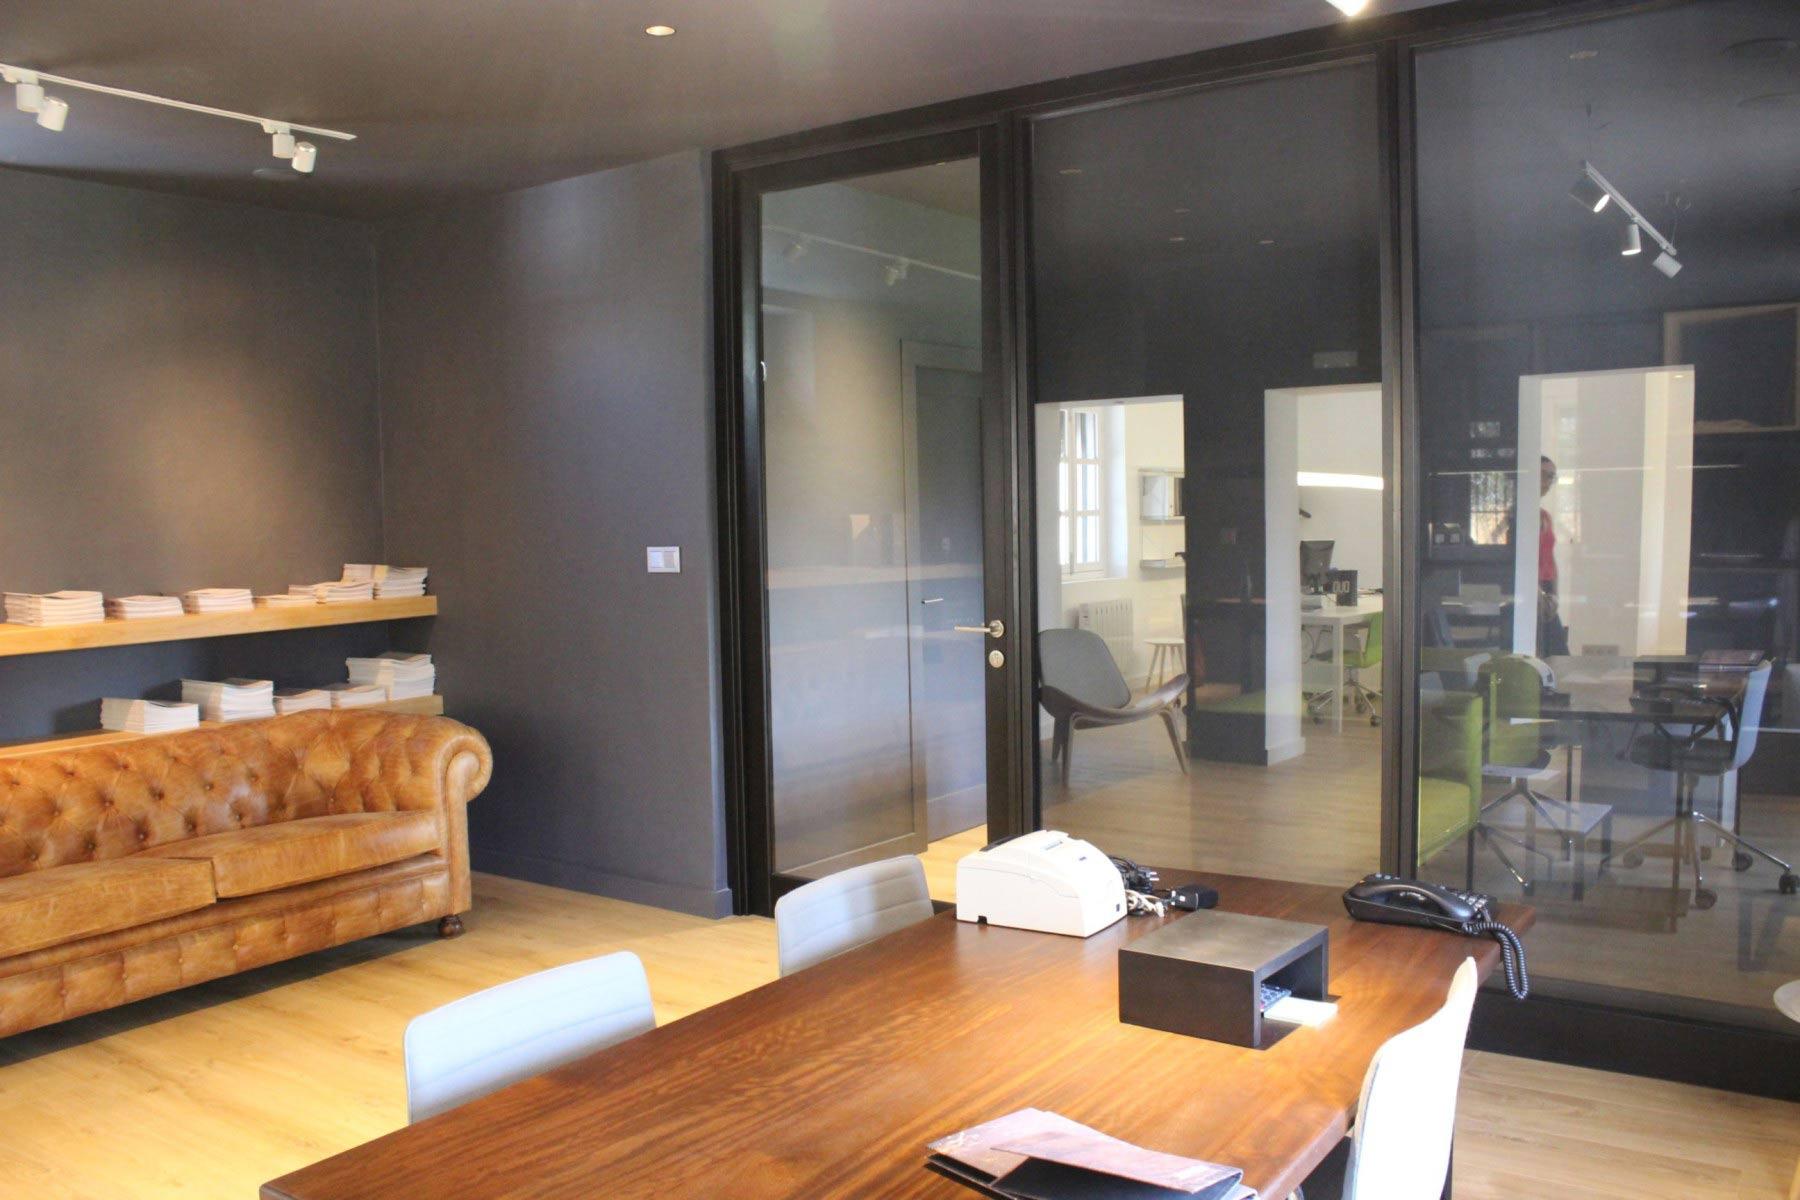 Oficina moderna con puertas correderas